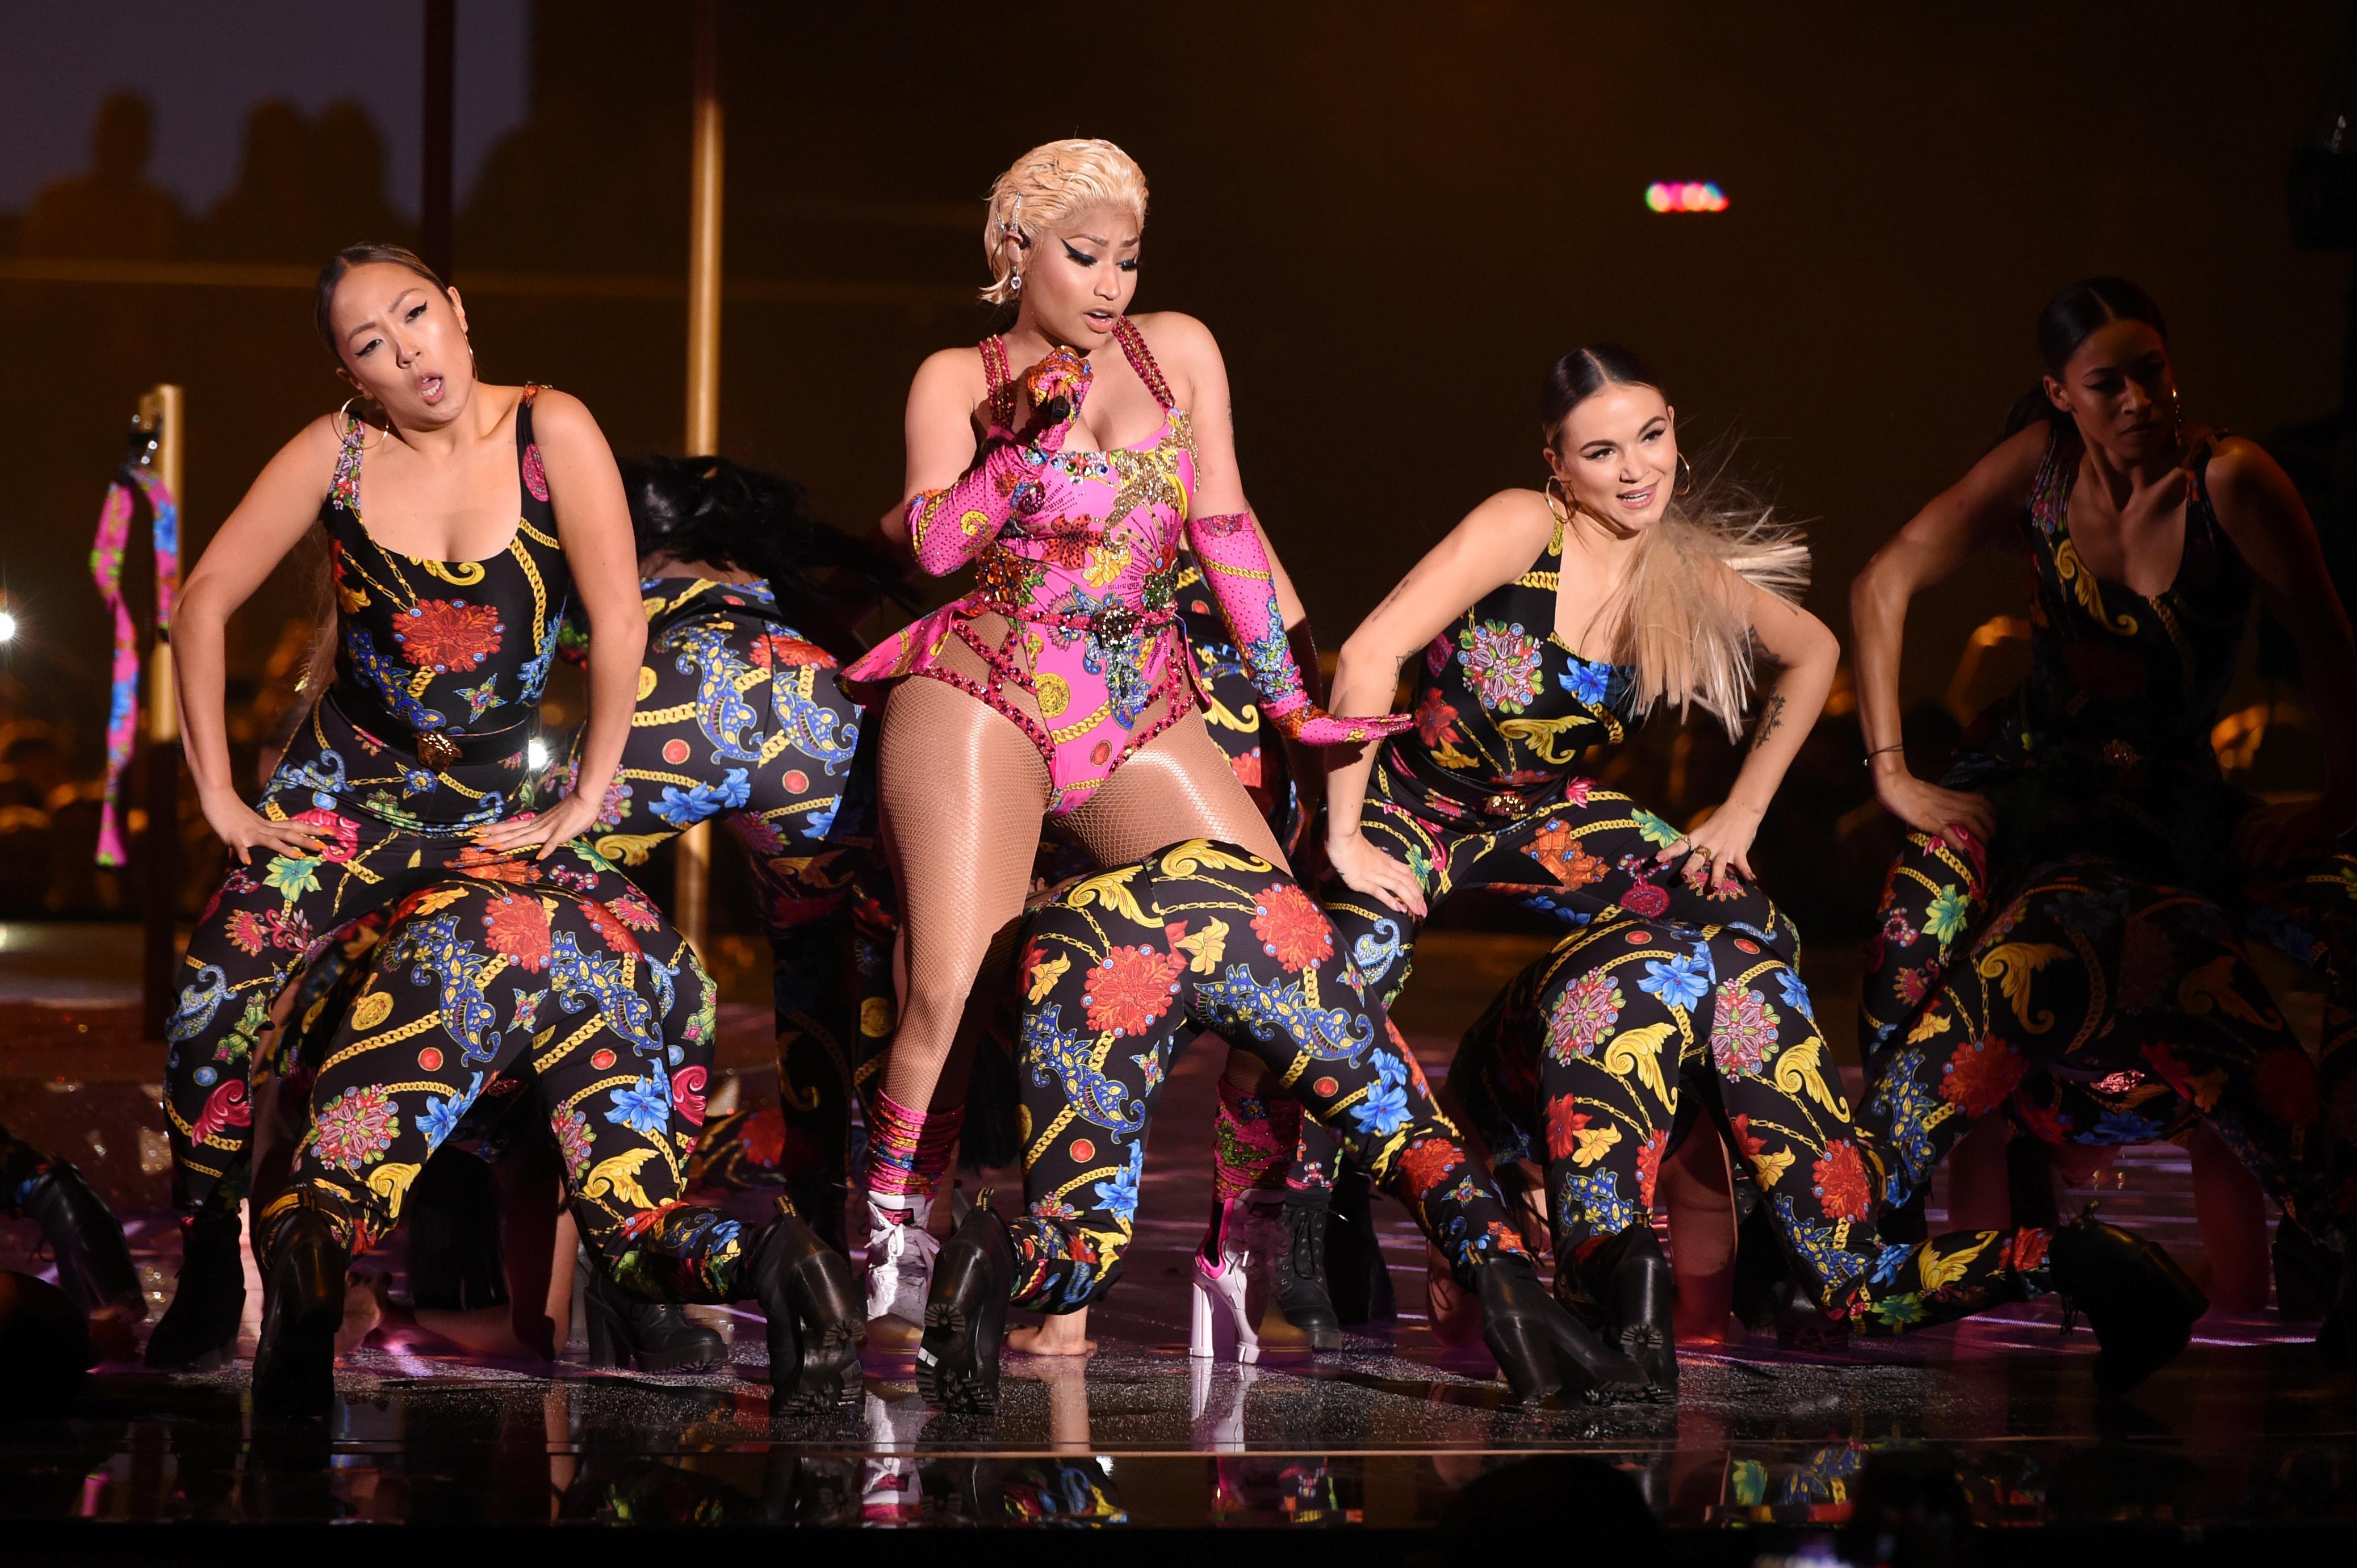 Image result for 'Bang Bang': Nicki Minaj stuns fans with retirement announcement